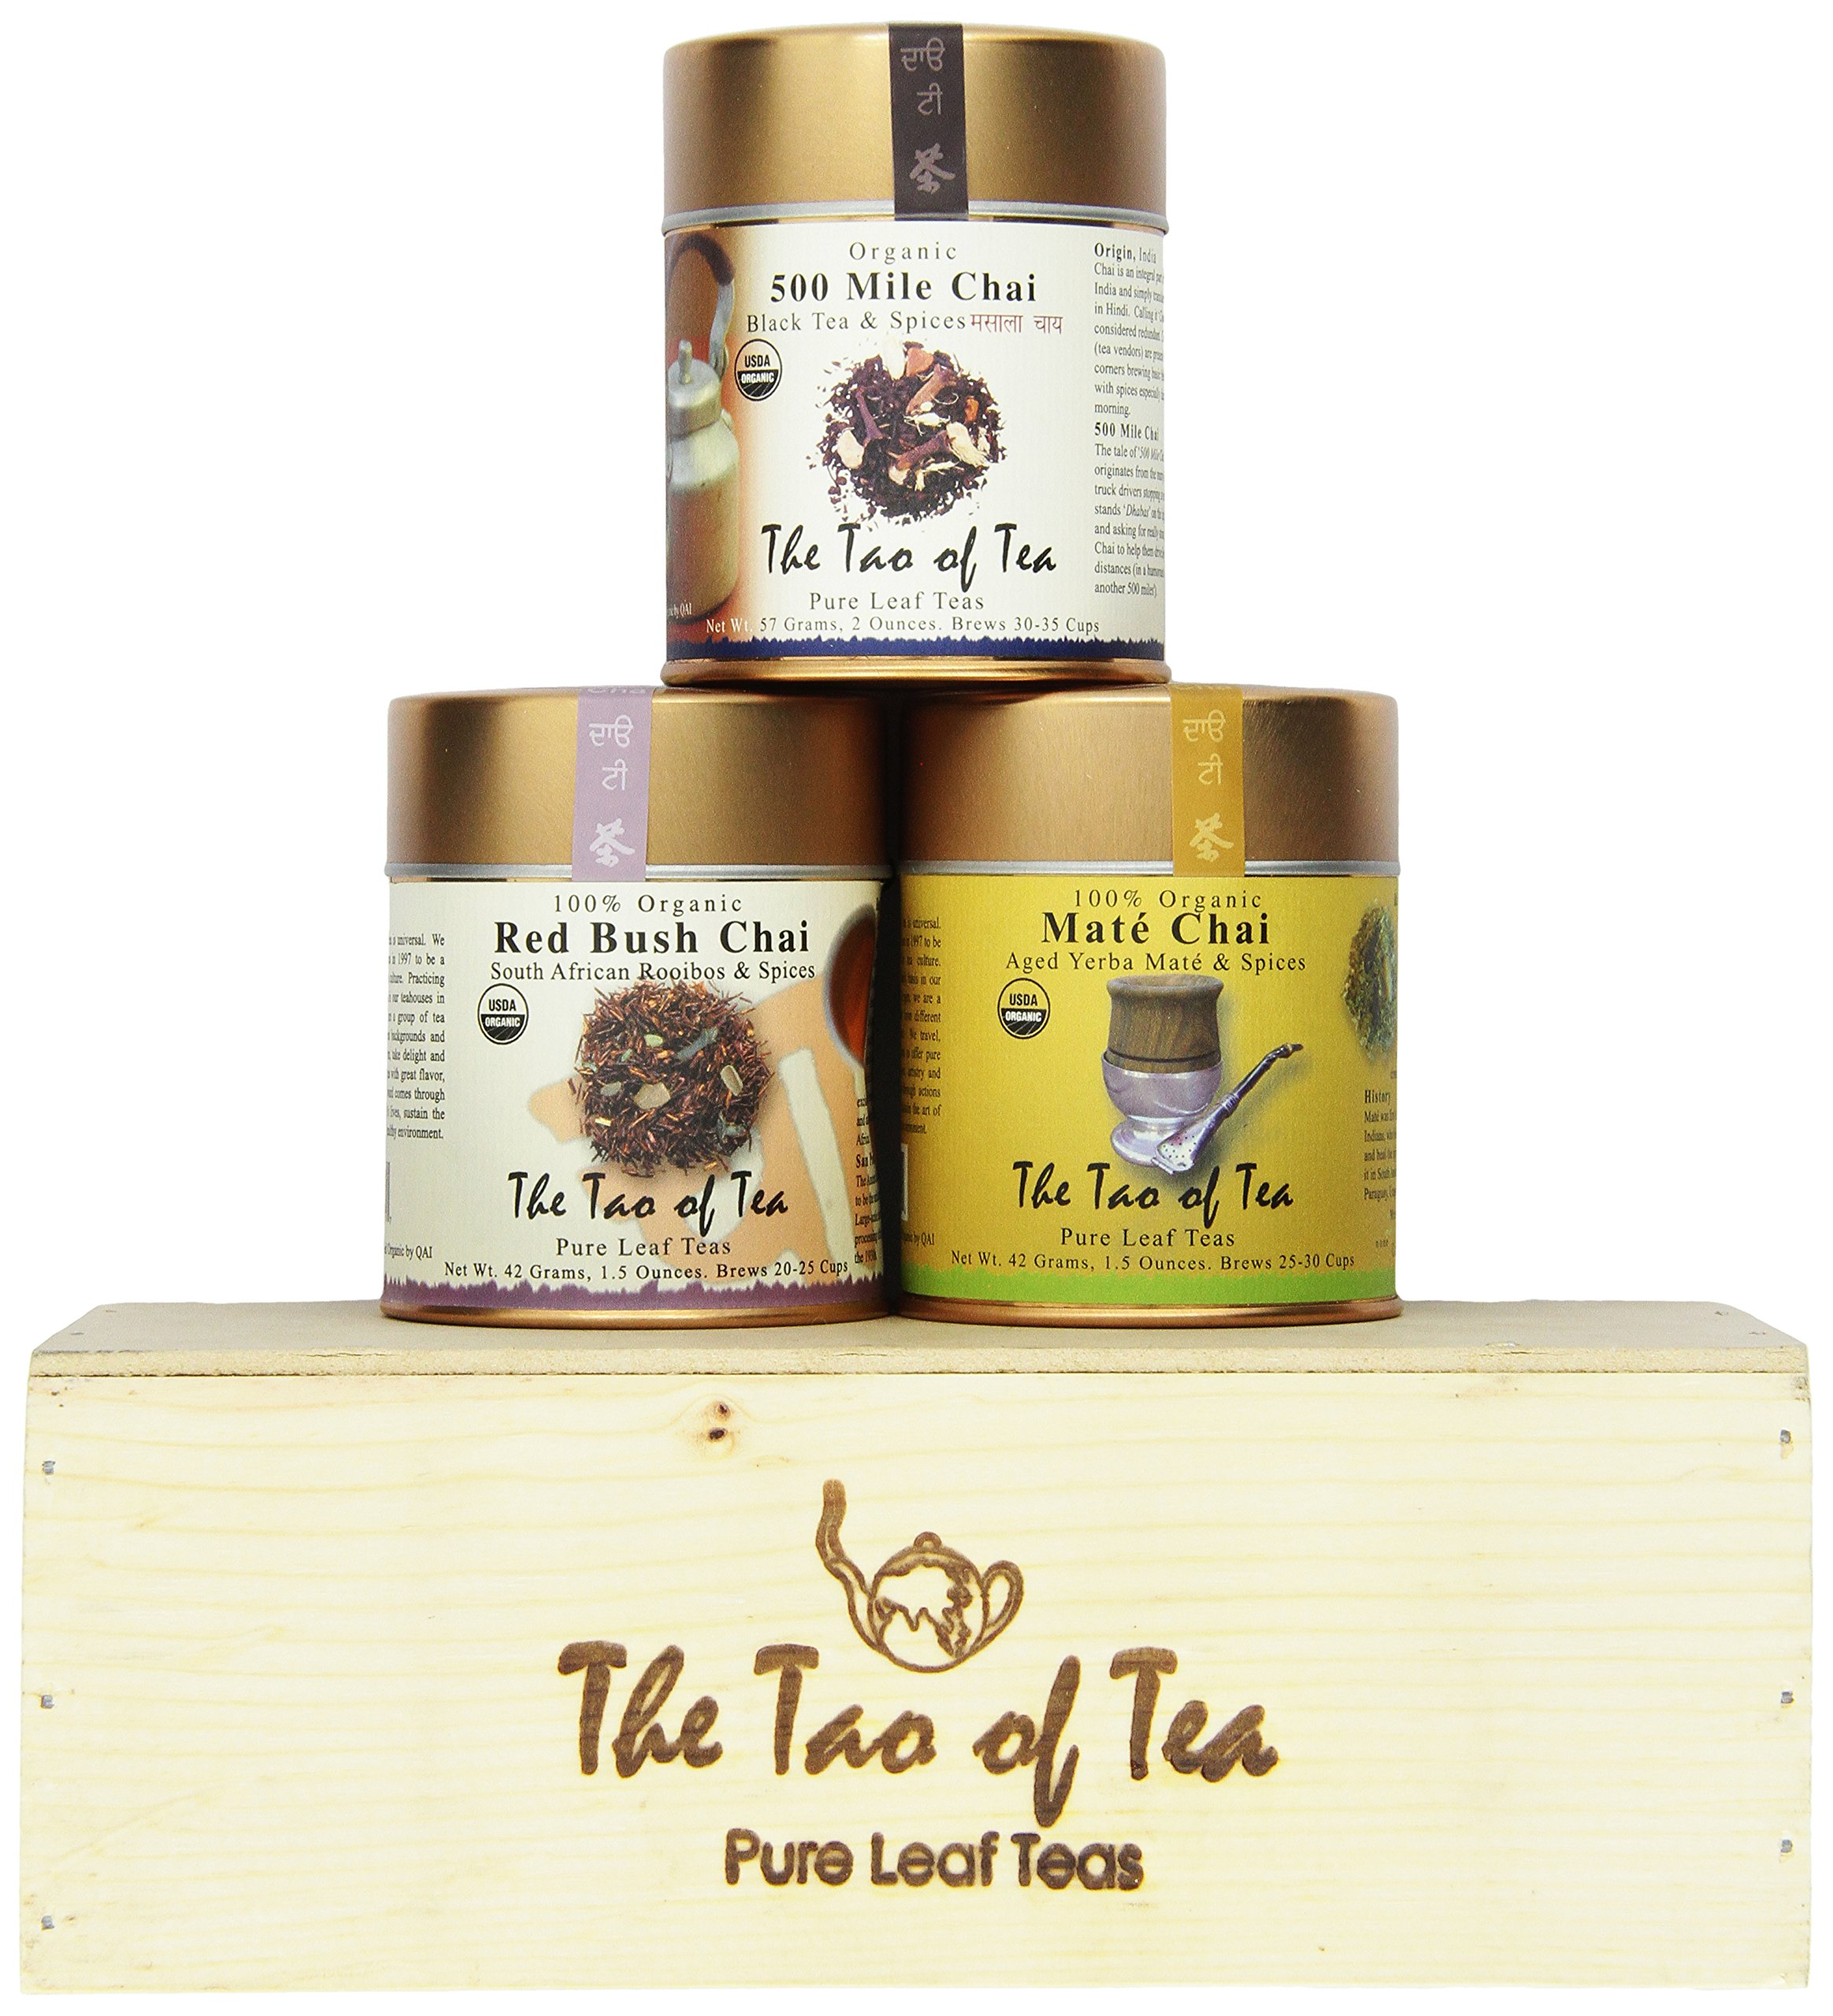 The Tao of Tea Chai Sampler, 3-Count Box